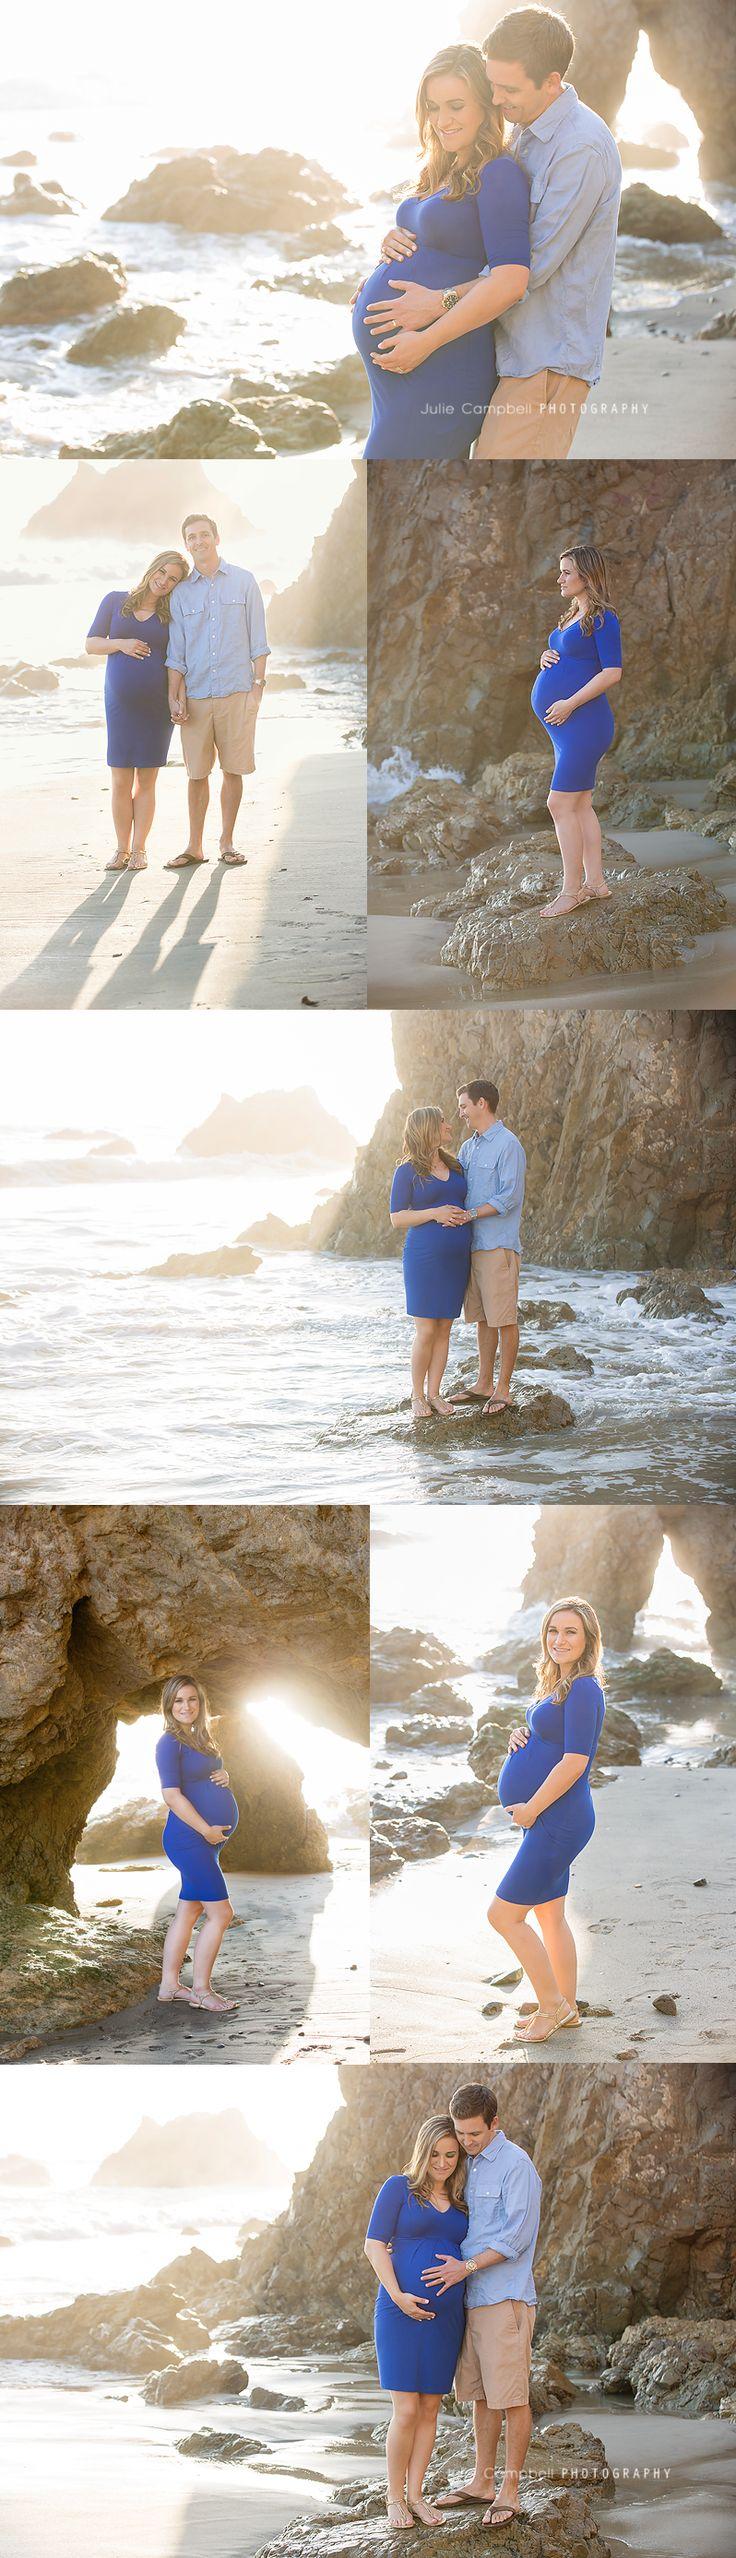 Dreamy maternity photos on the beach in Malibu. Maternity Photo Session at the Beach | California #maternityphotographer | Camarillo | Thousand Oaks | Westlake Village | Agoura Hills | Ventura County #beachphotographer #californiaphotographer malibuphotographer